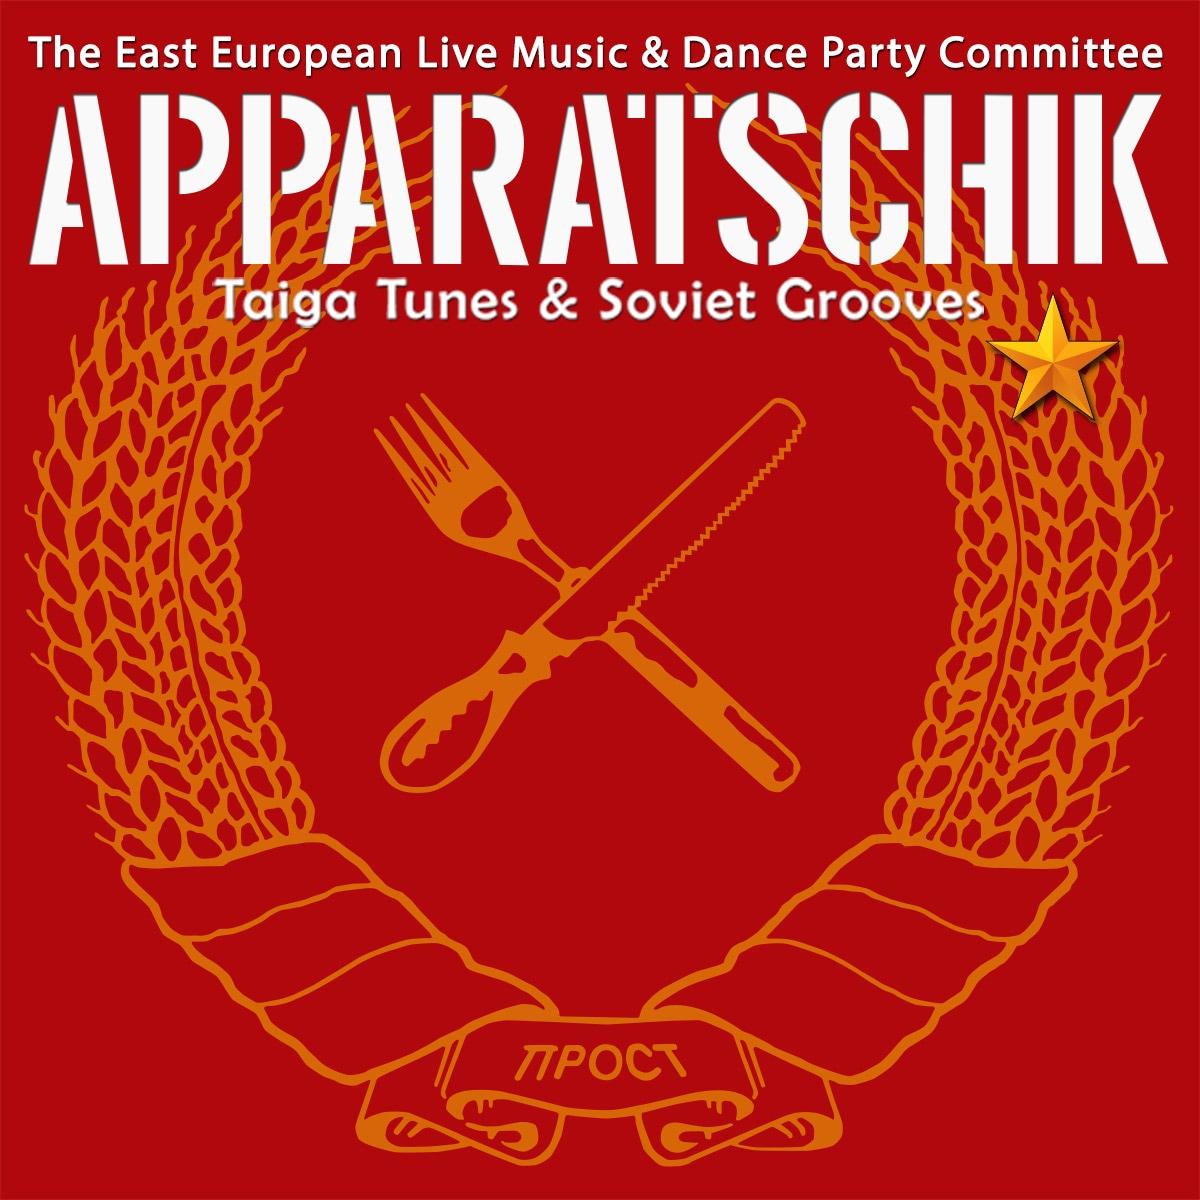 xs-APPARATSCHIK-logo_150102